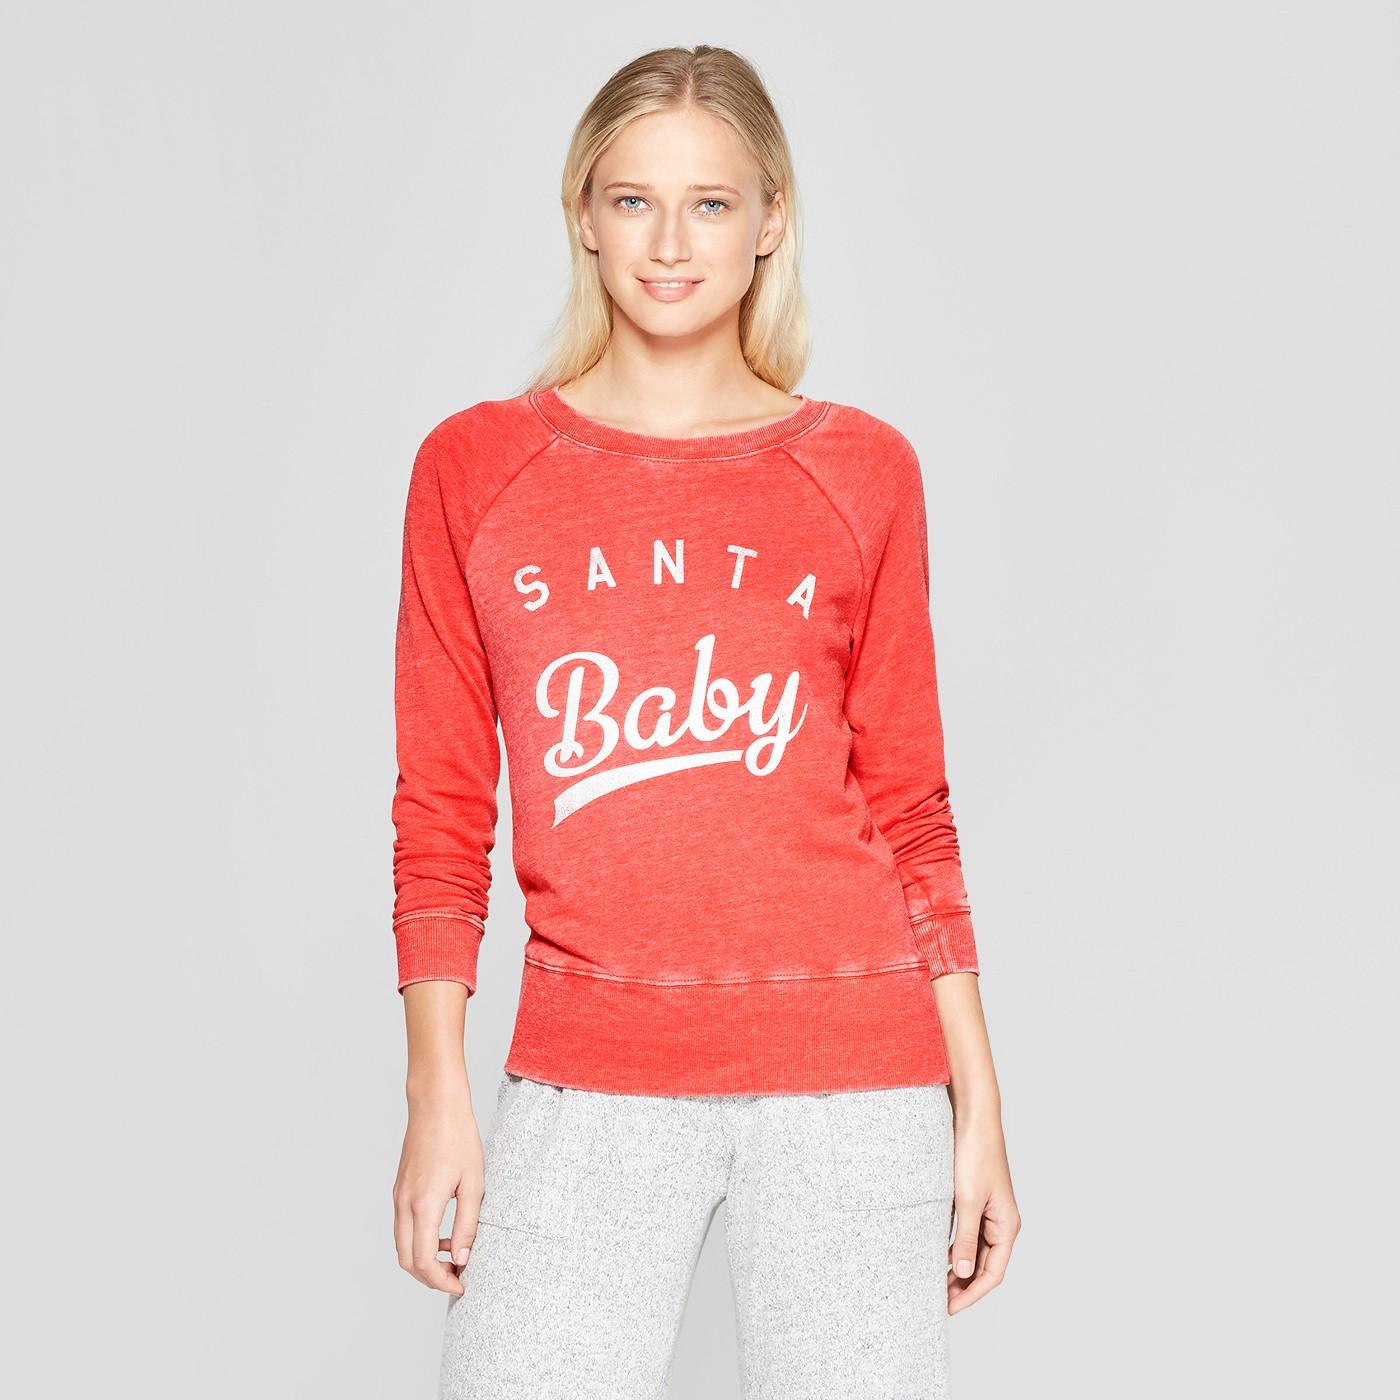 Grayson Threads Women's Holiday Santa Baby Crew Sleep Sweatshirt - Red - image 1 of 2